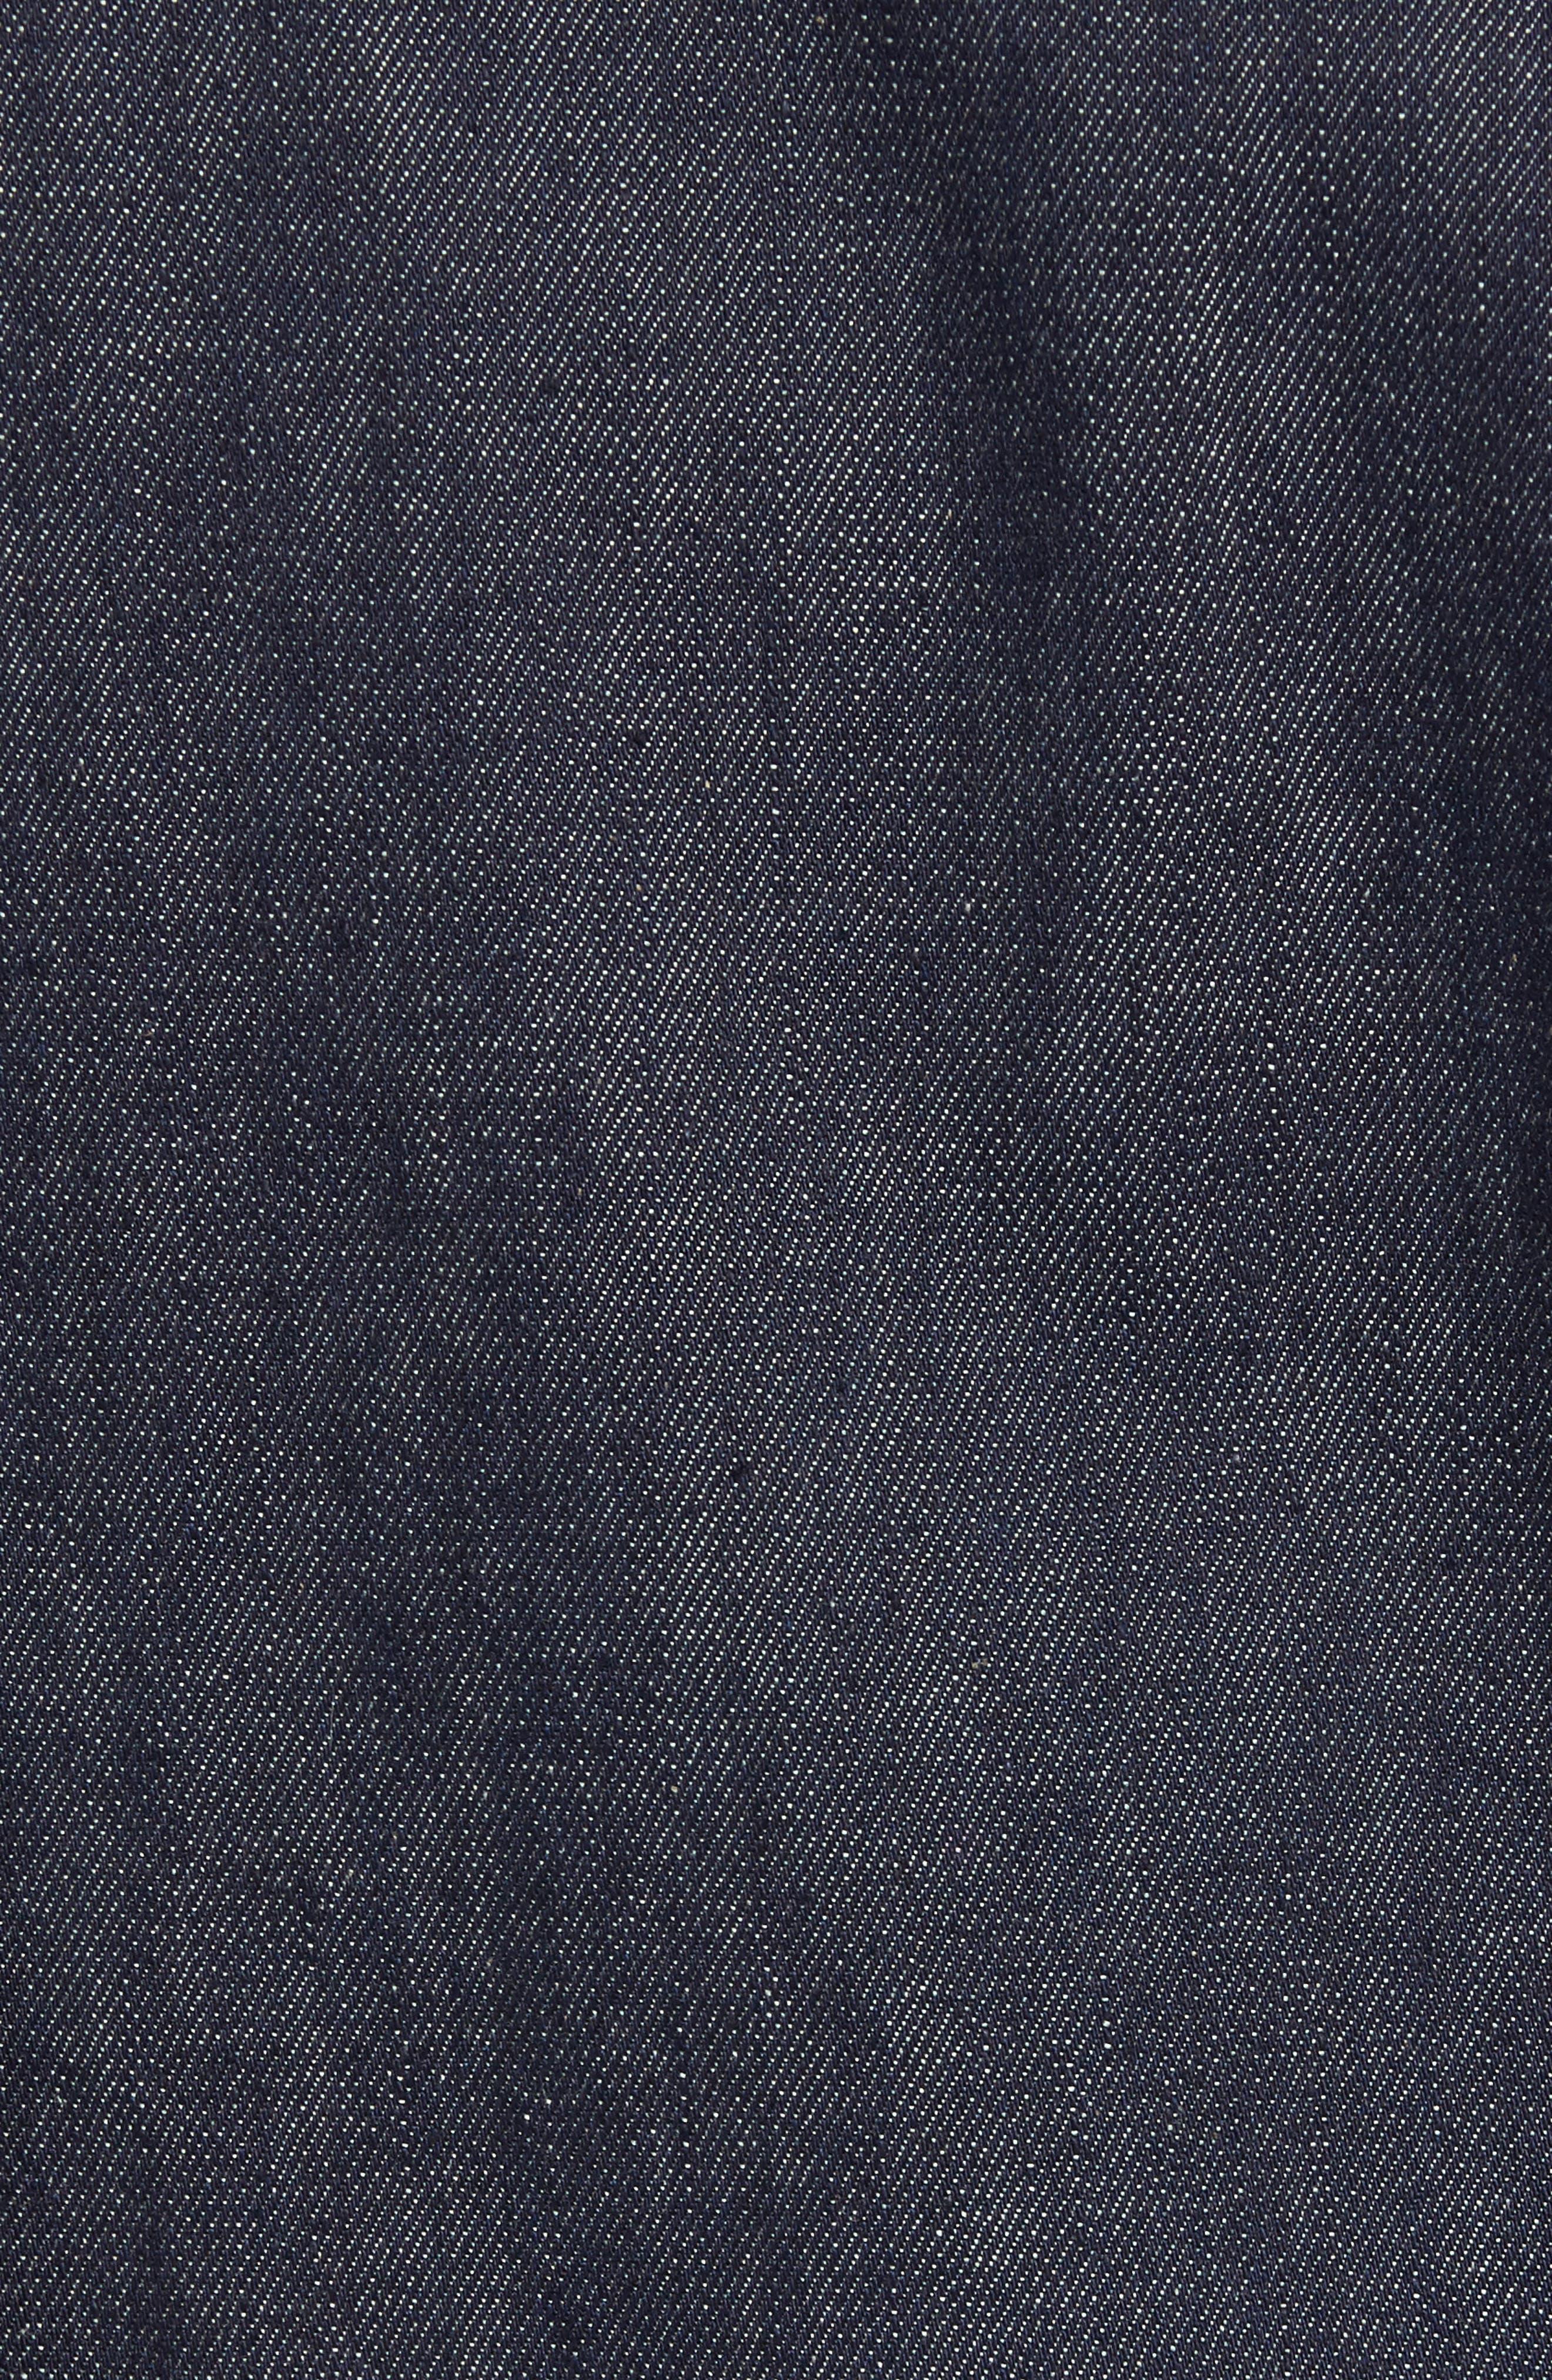 1936 Type I Denim Jacket,                             Alternate thumbnail 6, color,                             499